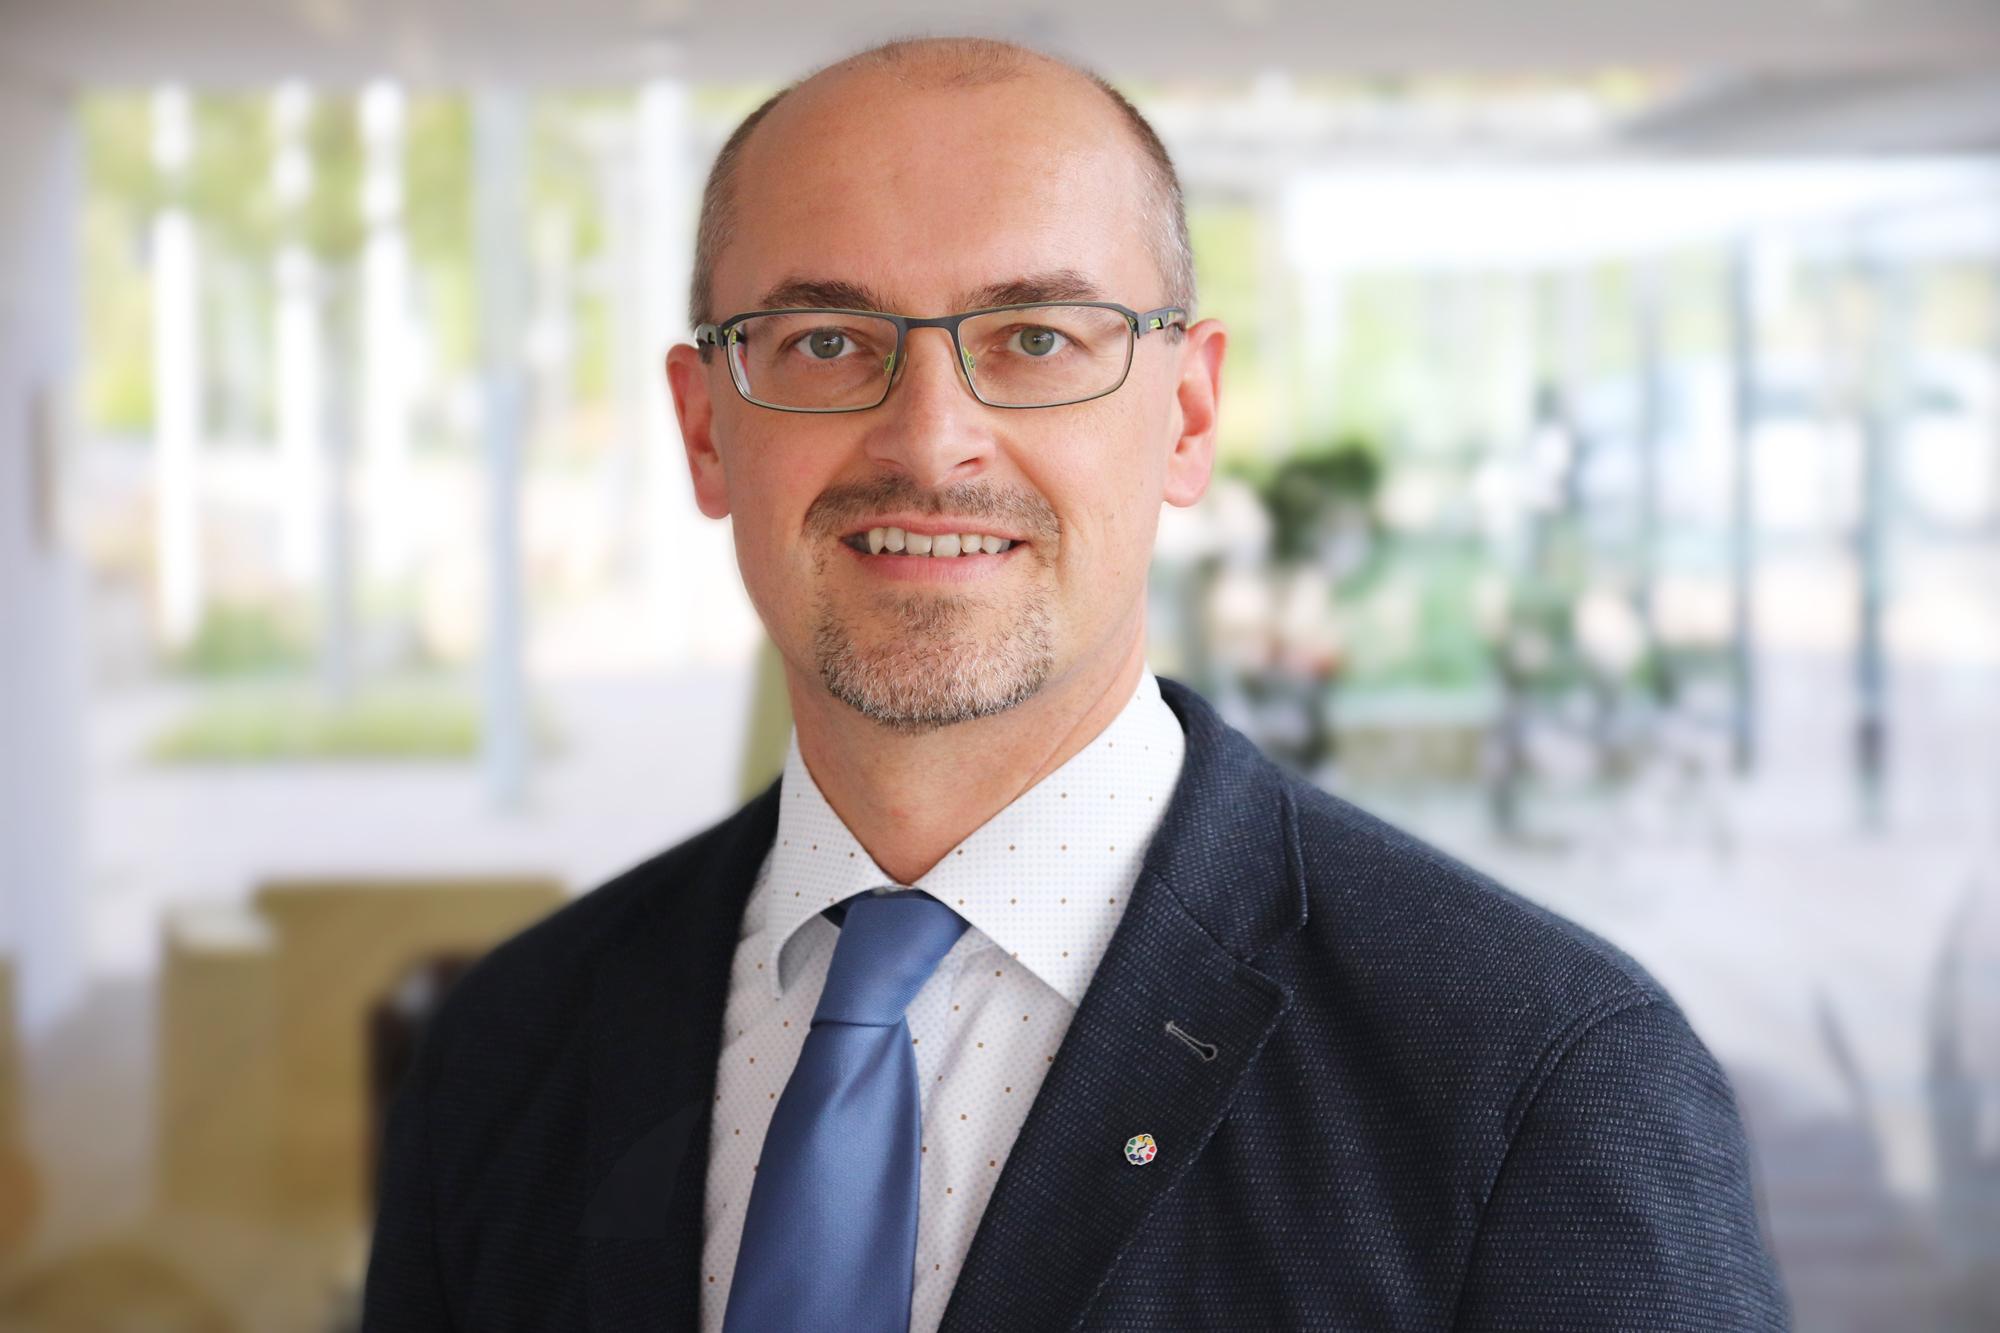 Mario Kleist